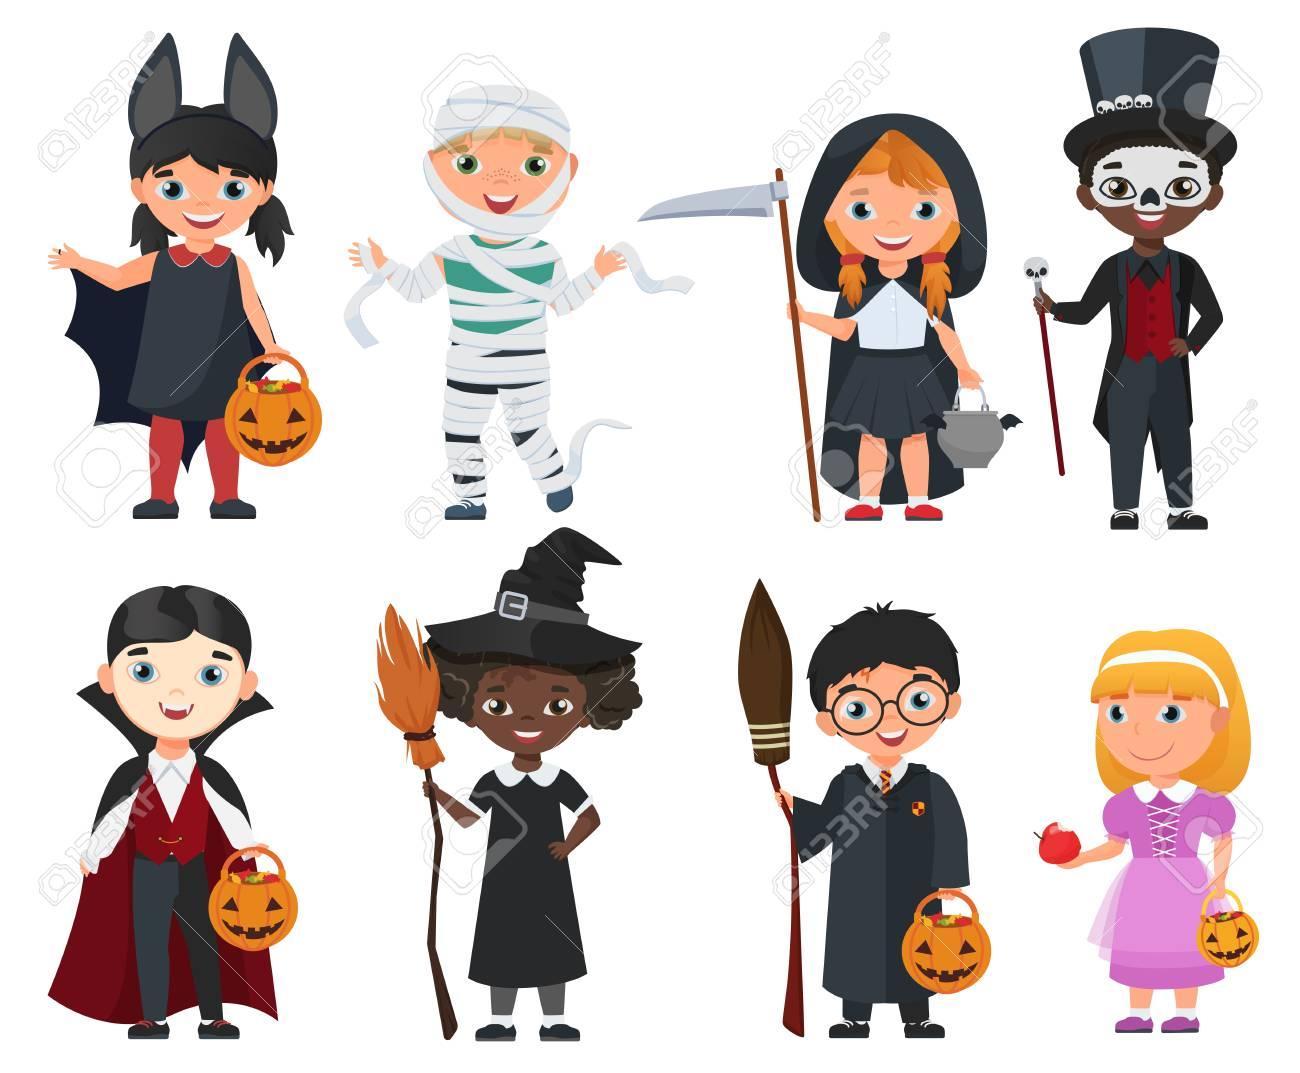 Cute Halloween kids set. Cartoon vector illustration - 87266654